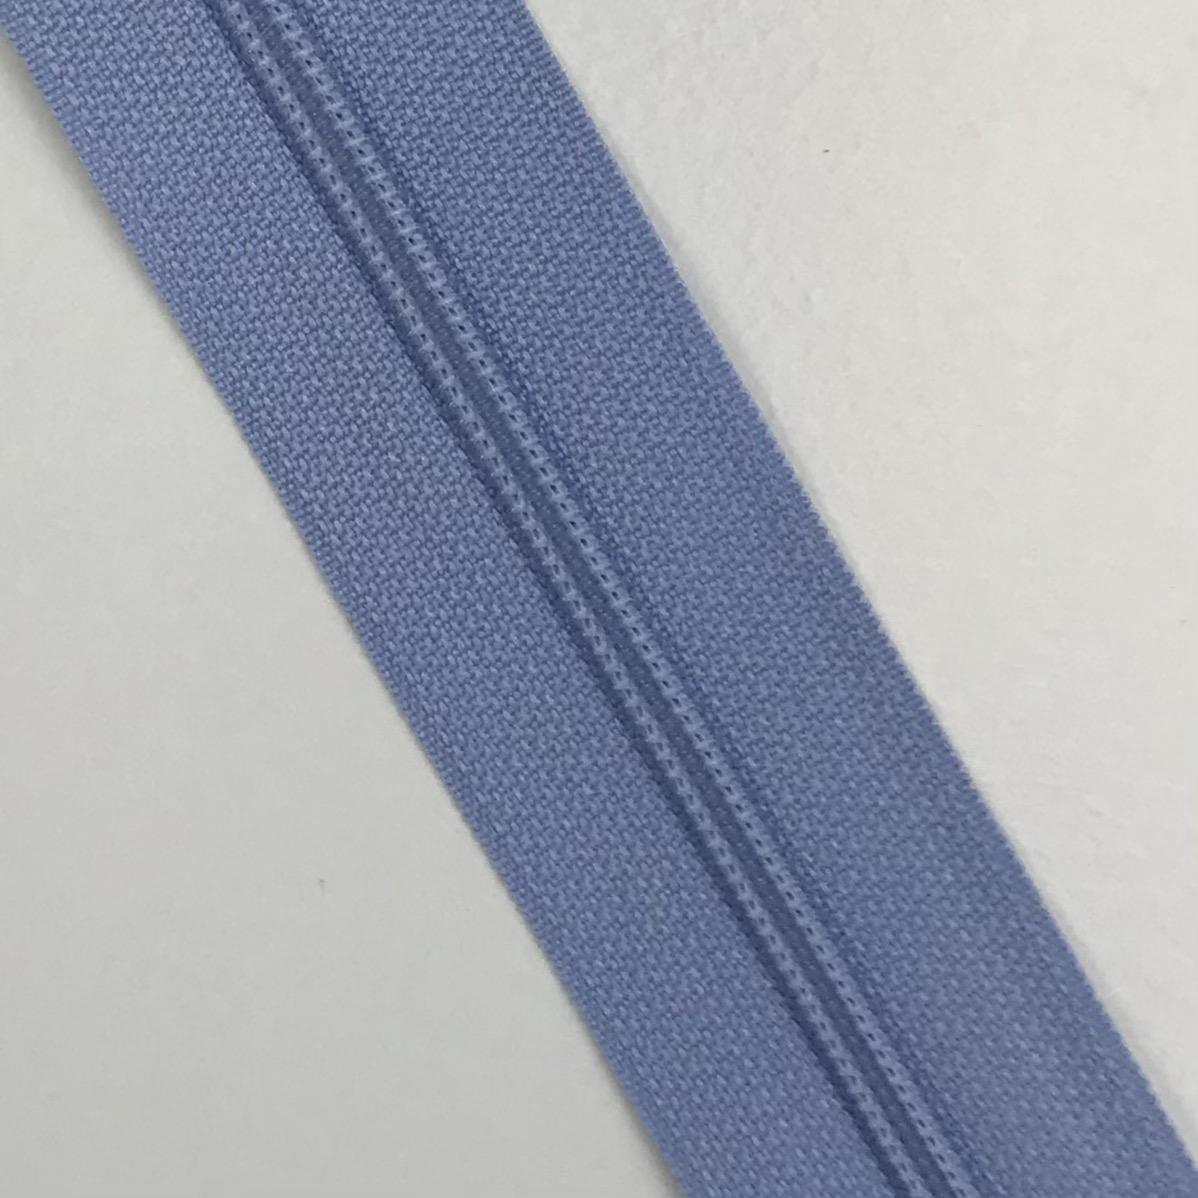 Endlosreißverschluss Meterware 3 mm, Union Knopf, hellblau, Farbe 64. Art. 4511